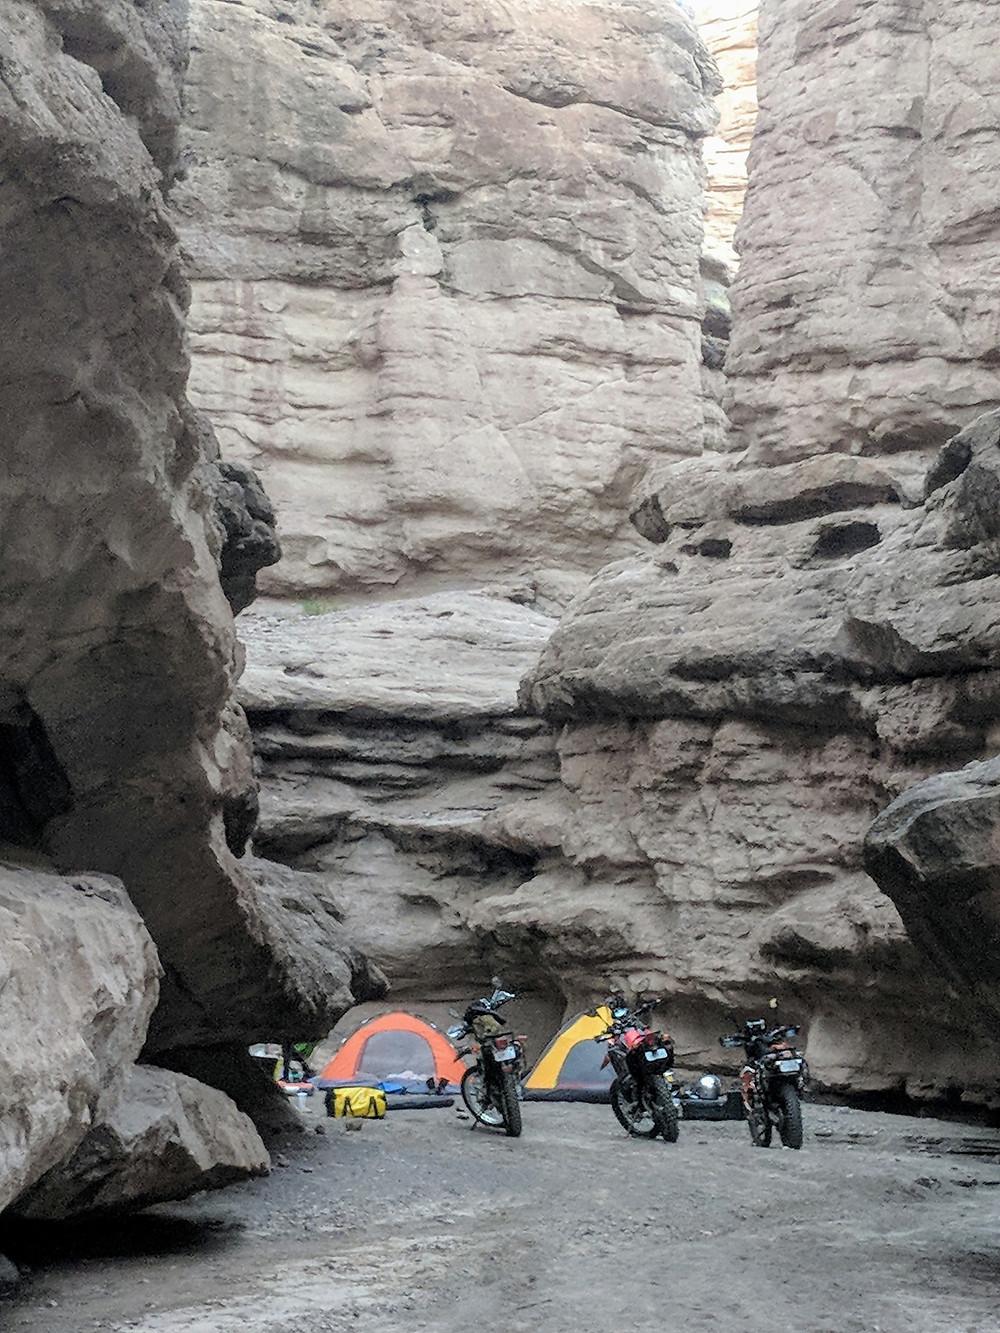 KTM 690, XT250 & 250L RALLY Camping in slot canyon